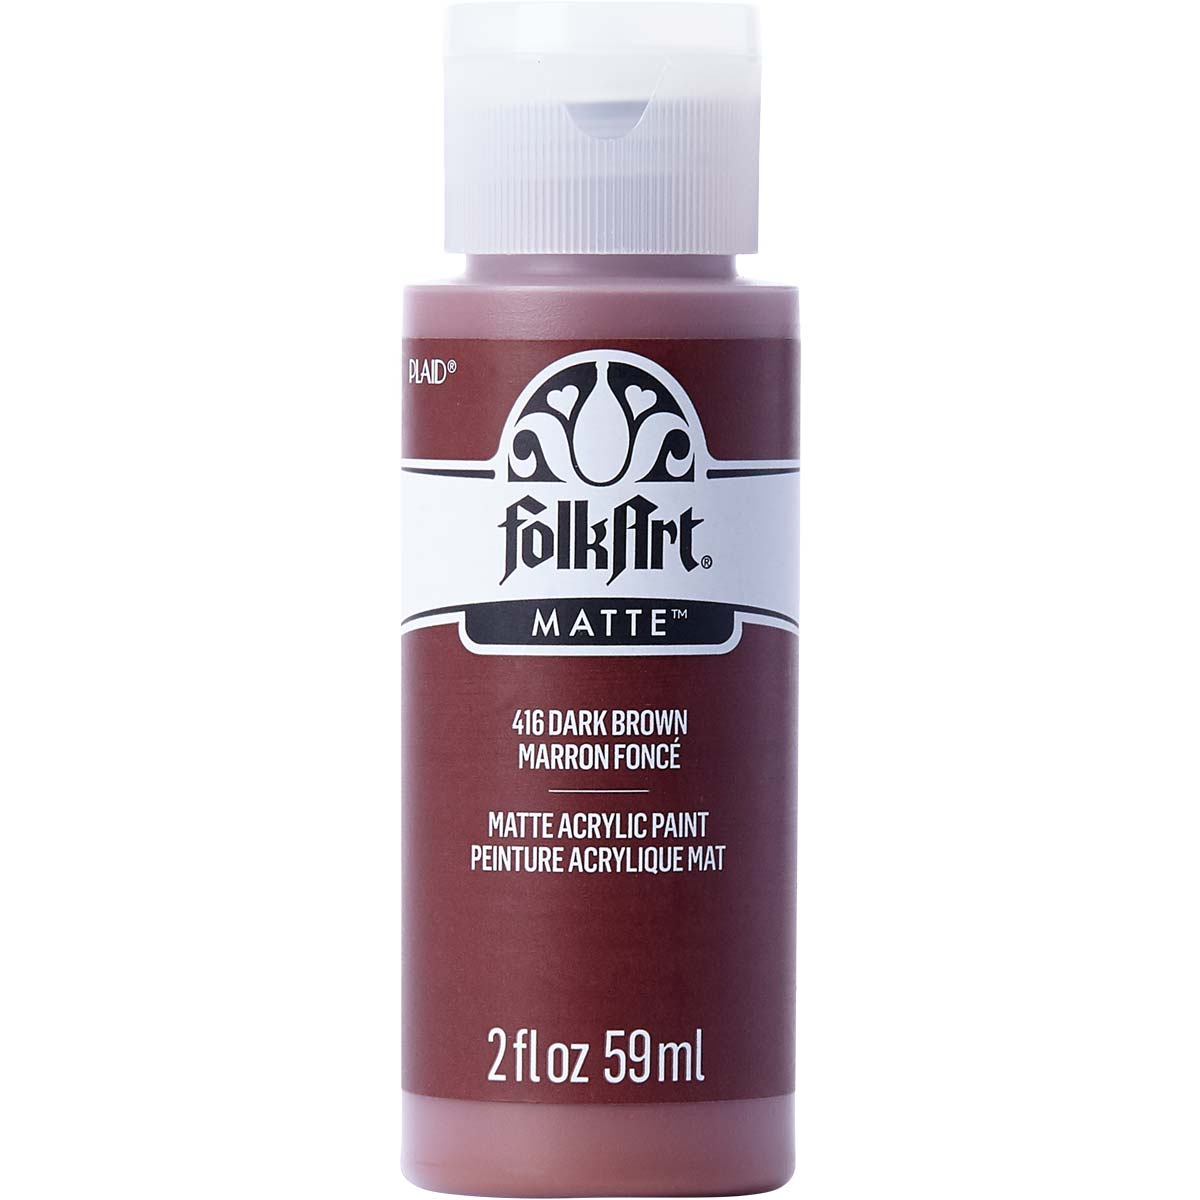 FolkArt ® Acrylic Colors - Dark Brown, 2 oz. - 416